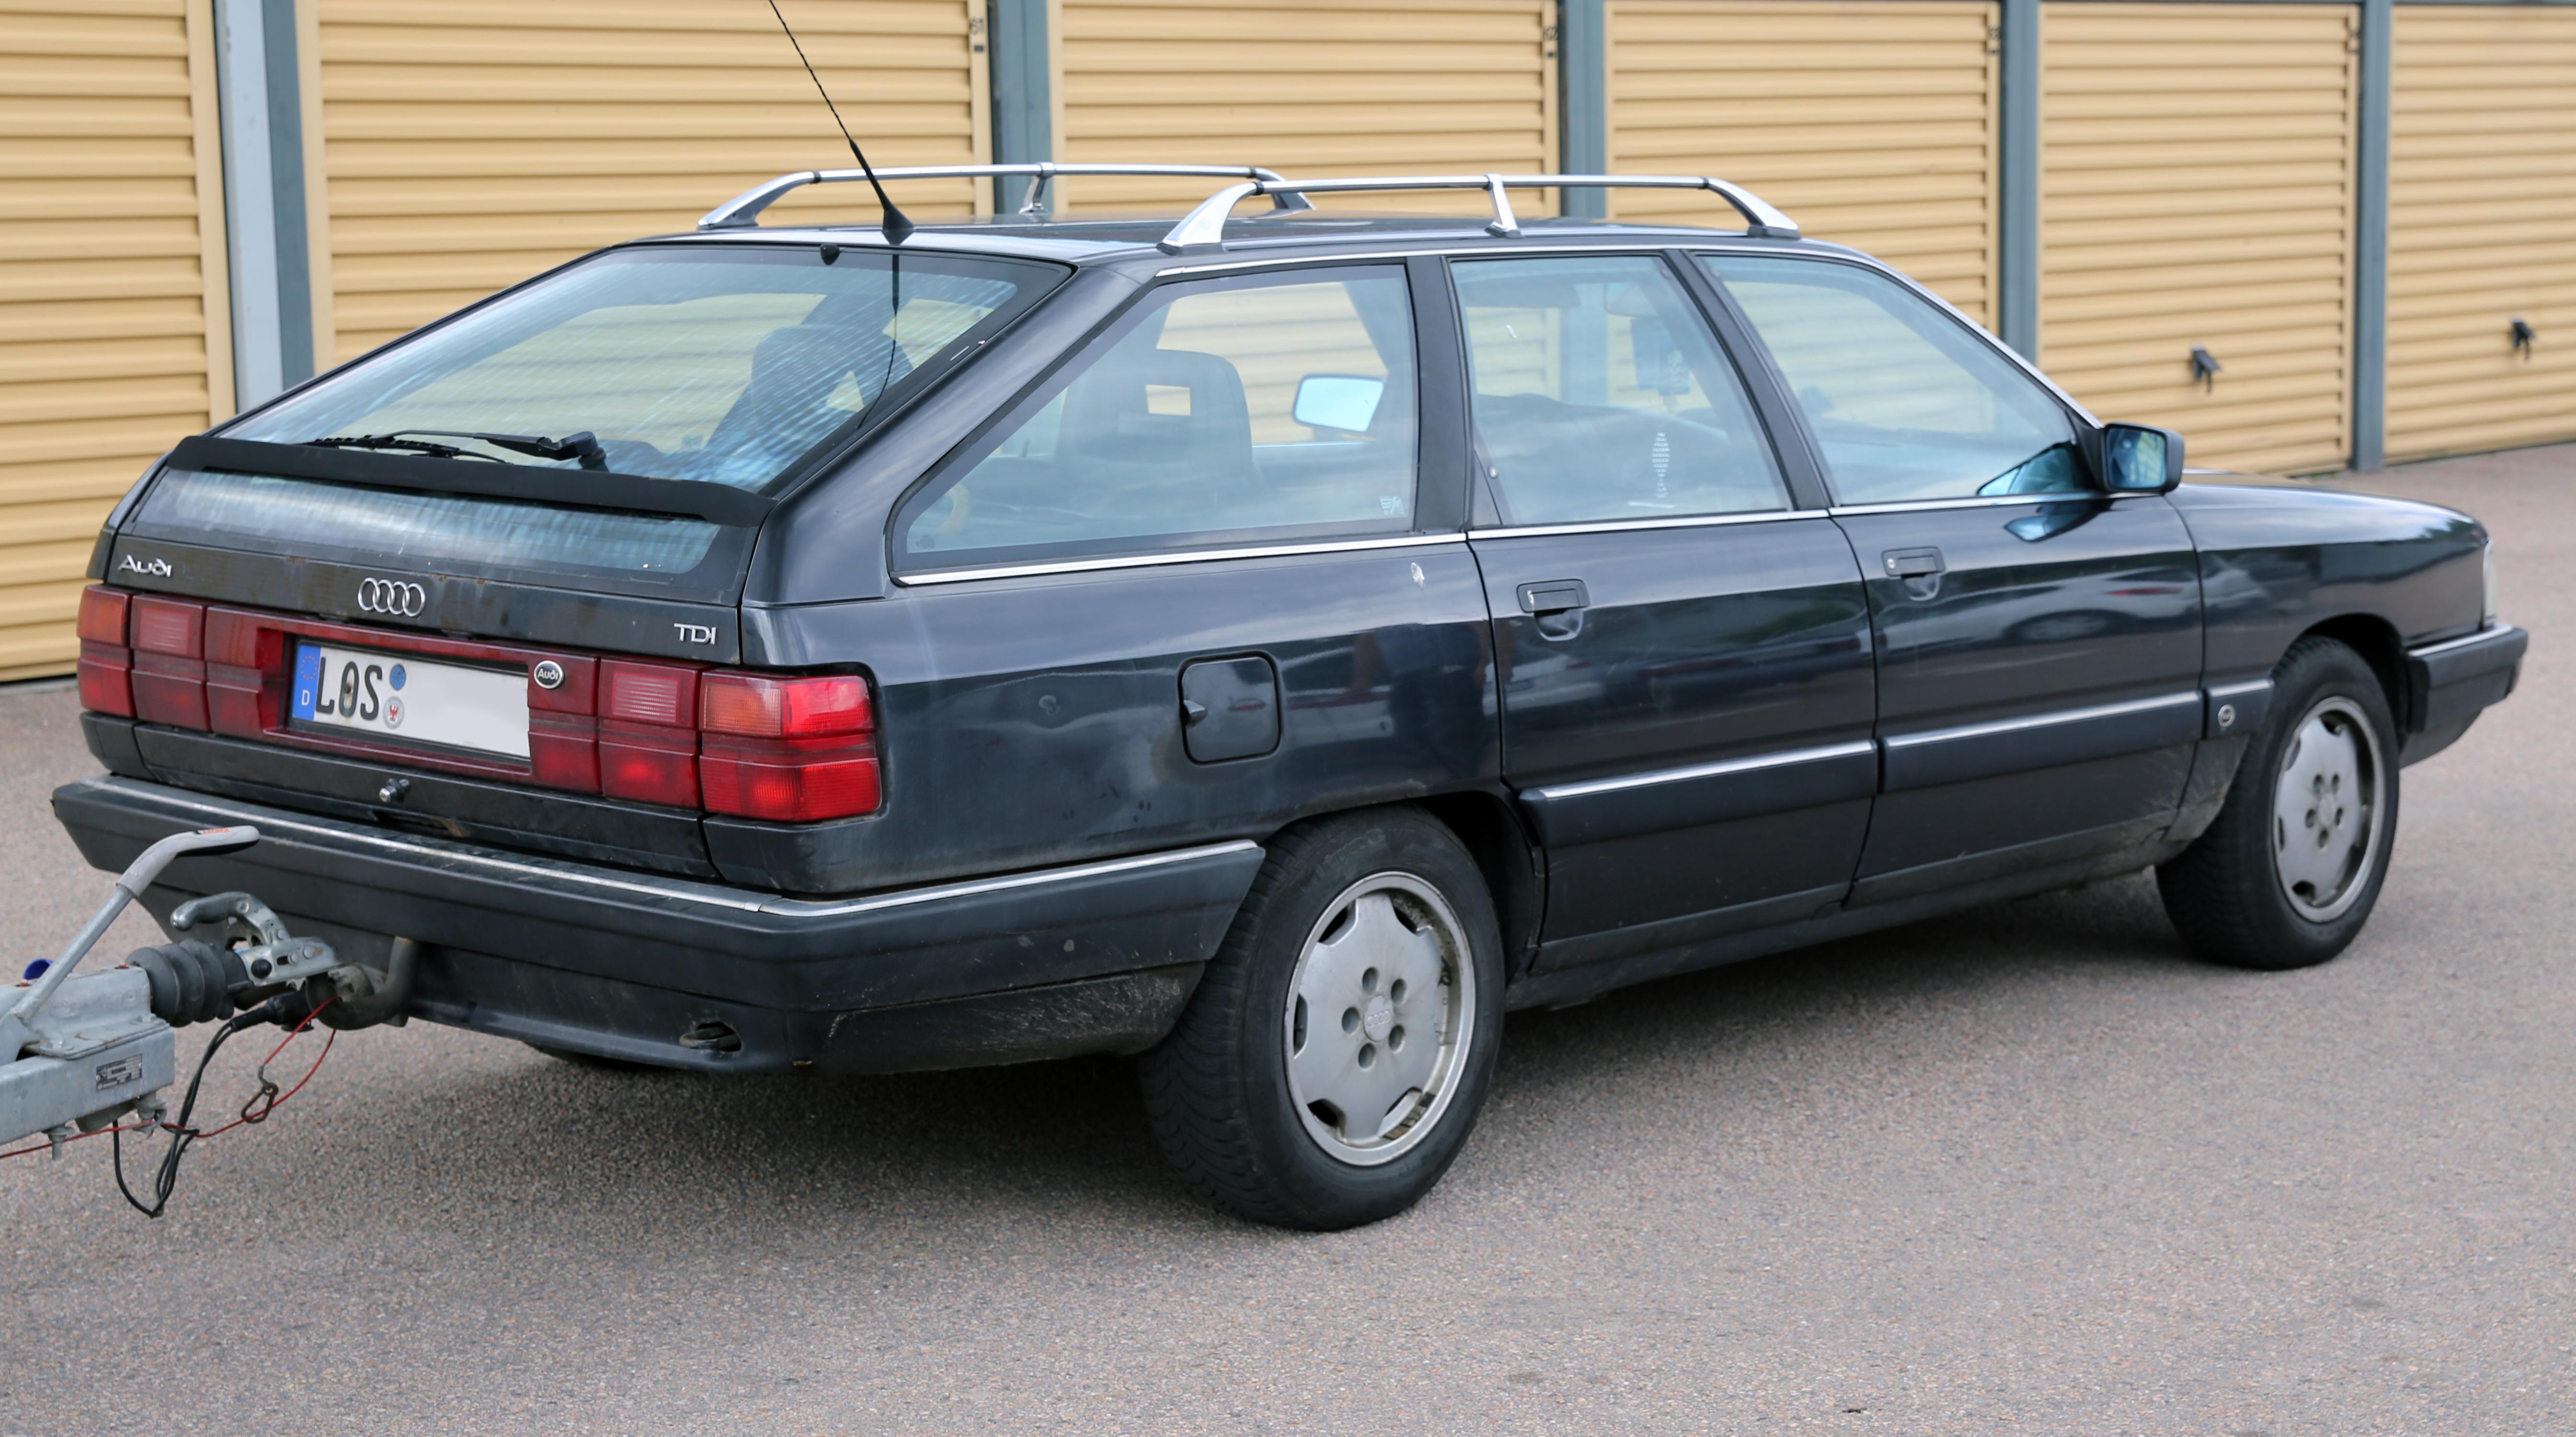 File:1990 Audi 100 Avant TDI rear.jpg - Wikimedia Commons